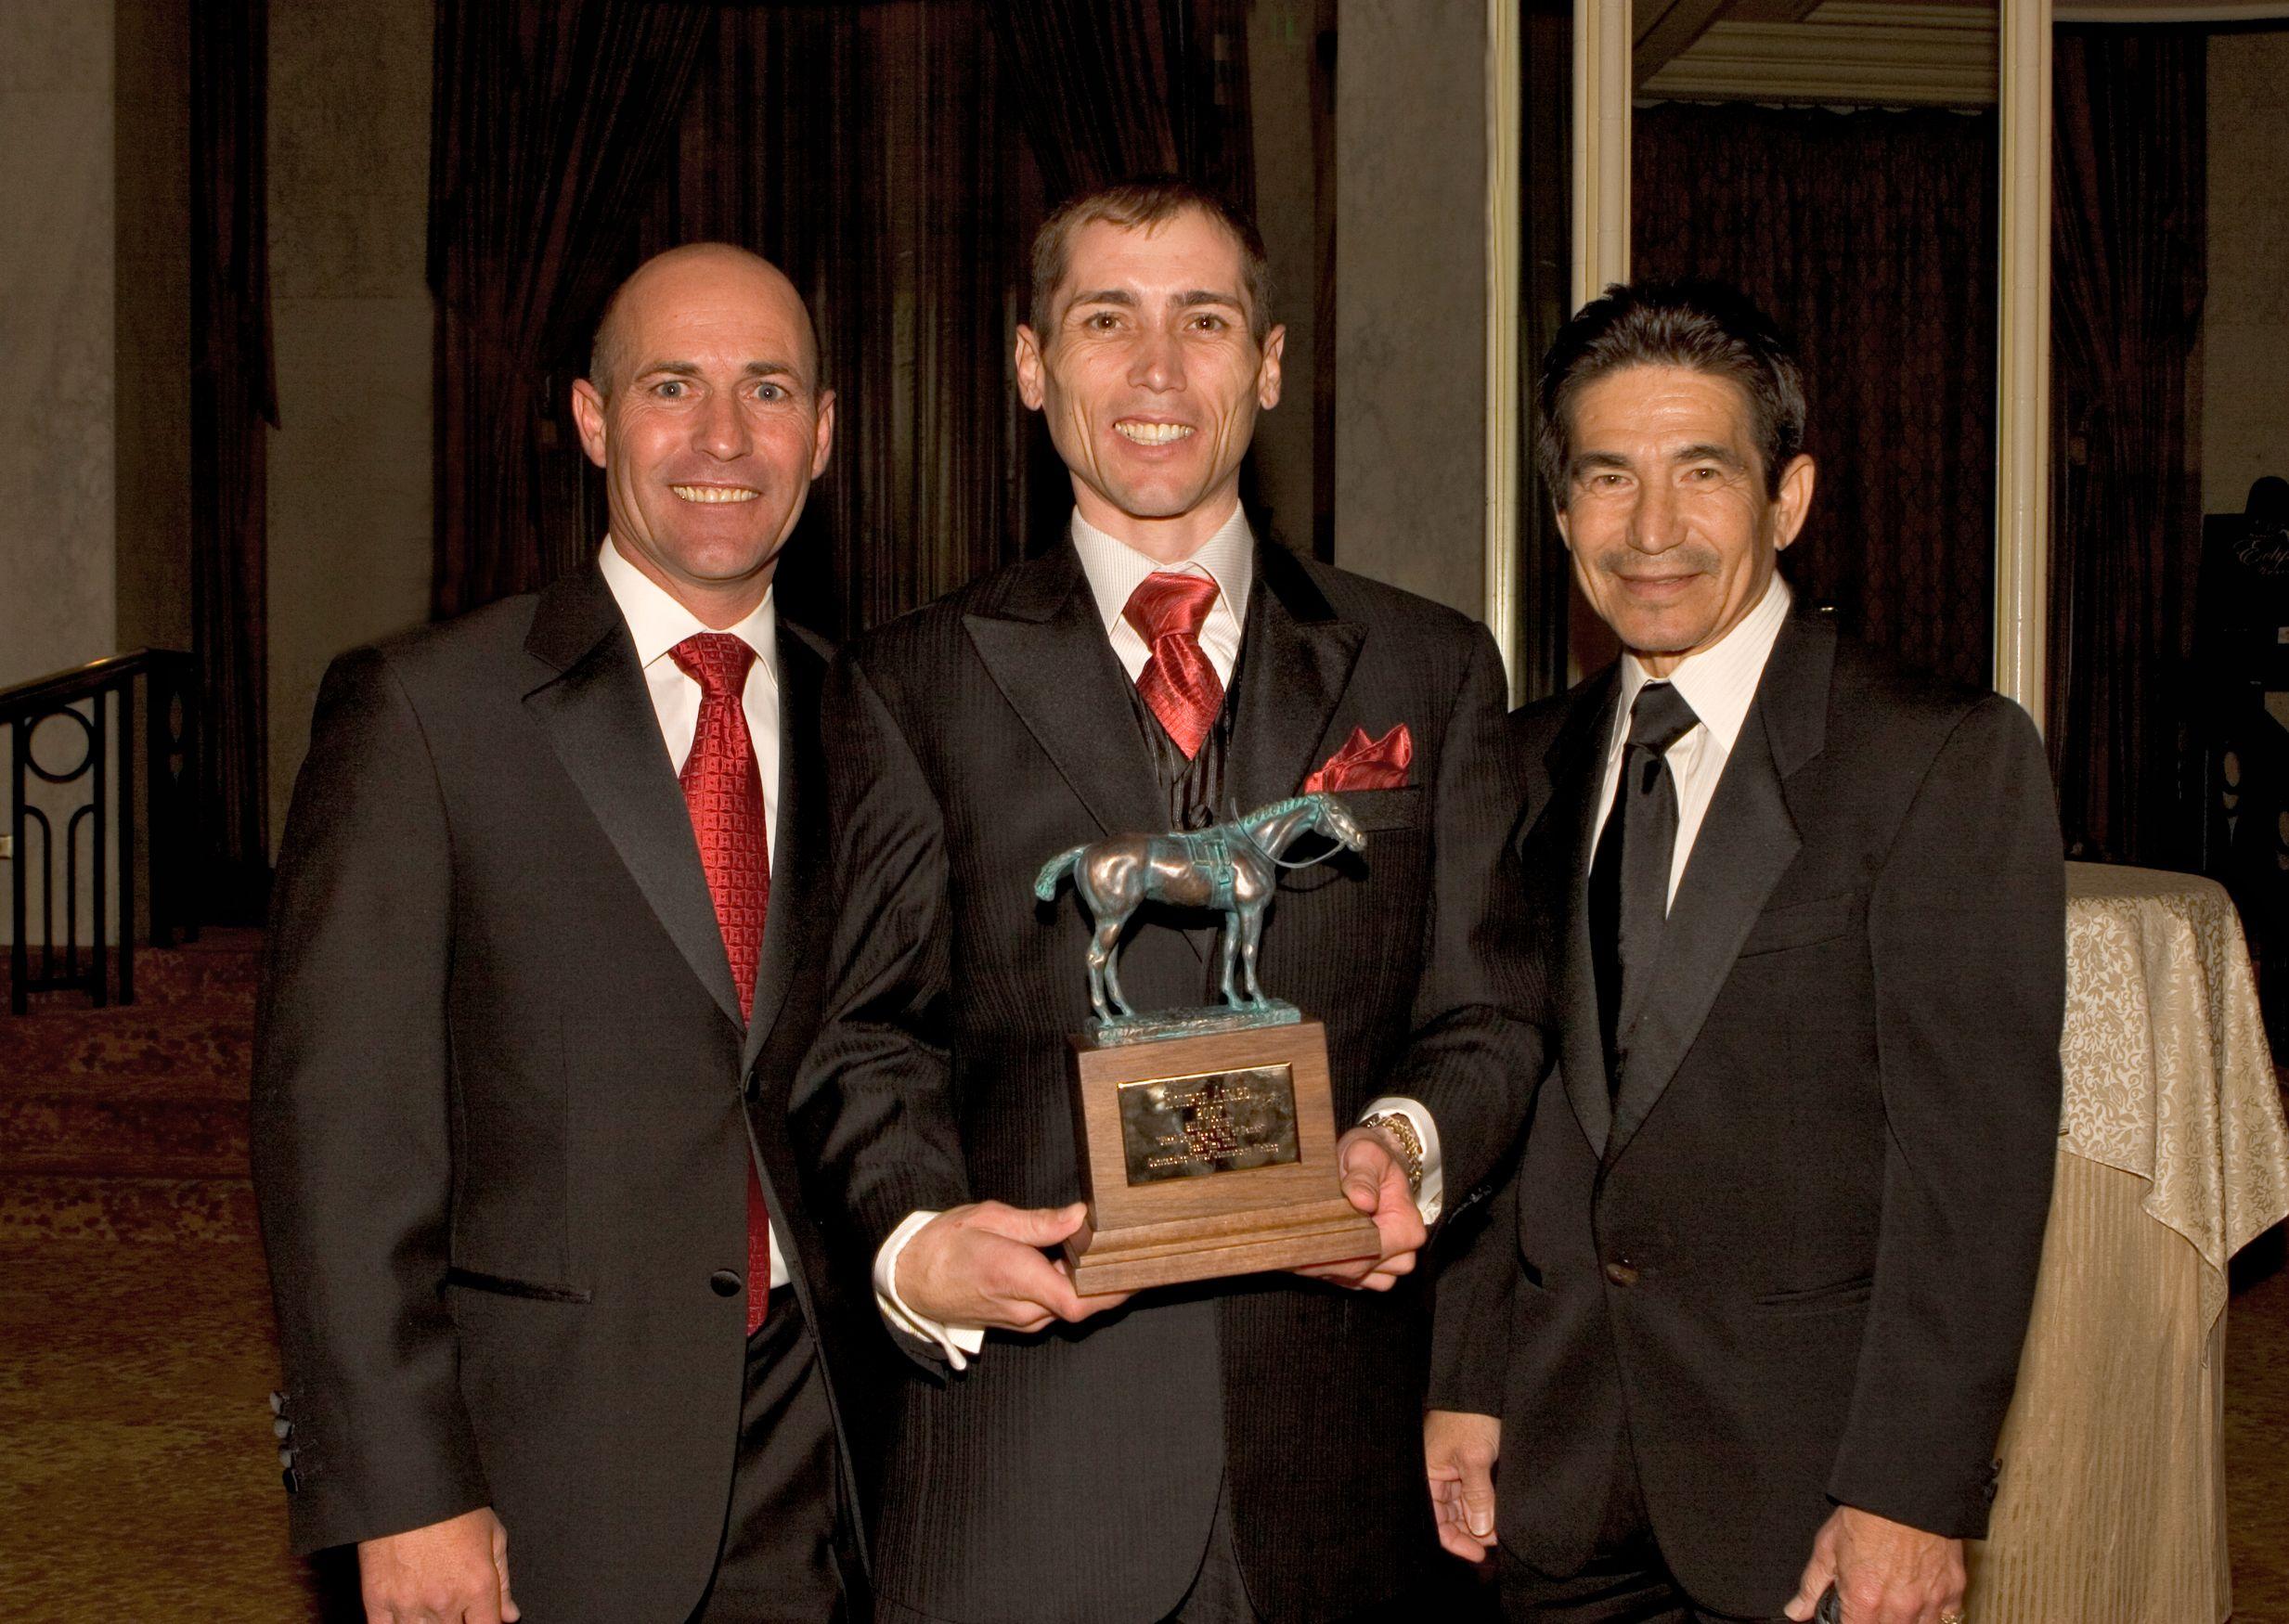 Garrett Gomez, middle, along with Gary Stevens, left, and Laffit Pincay, Jr. (Benoit Photo)